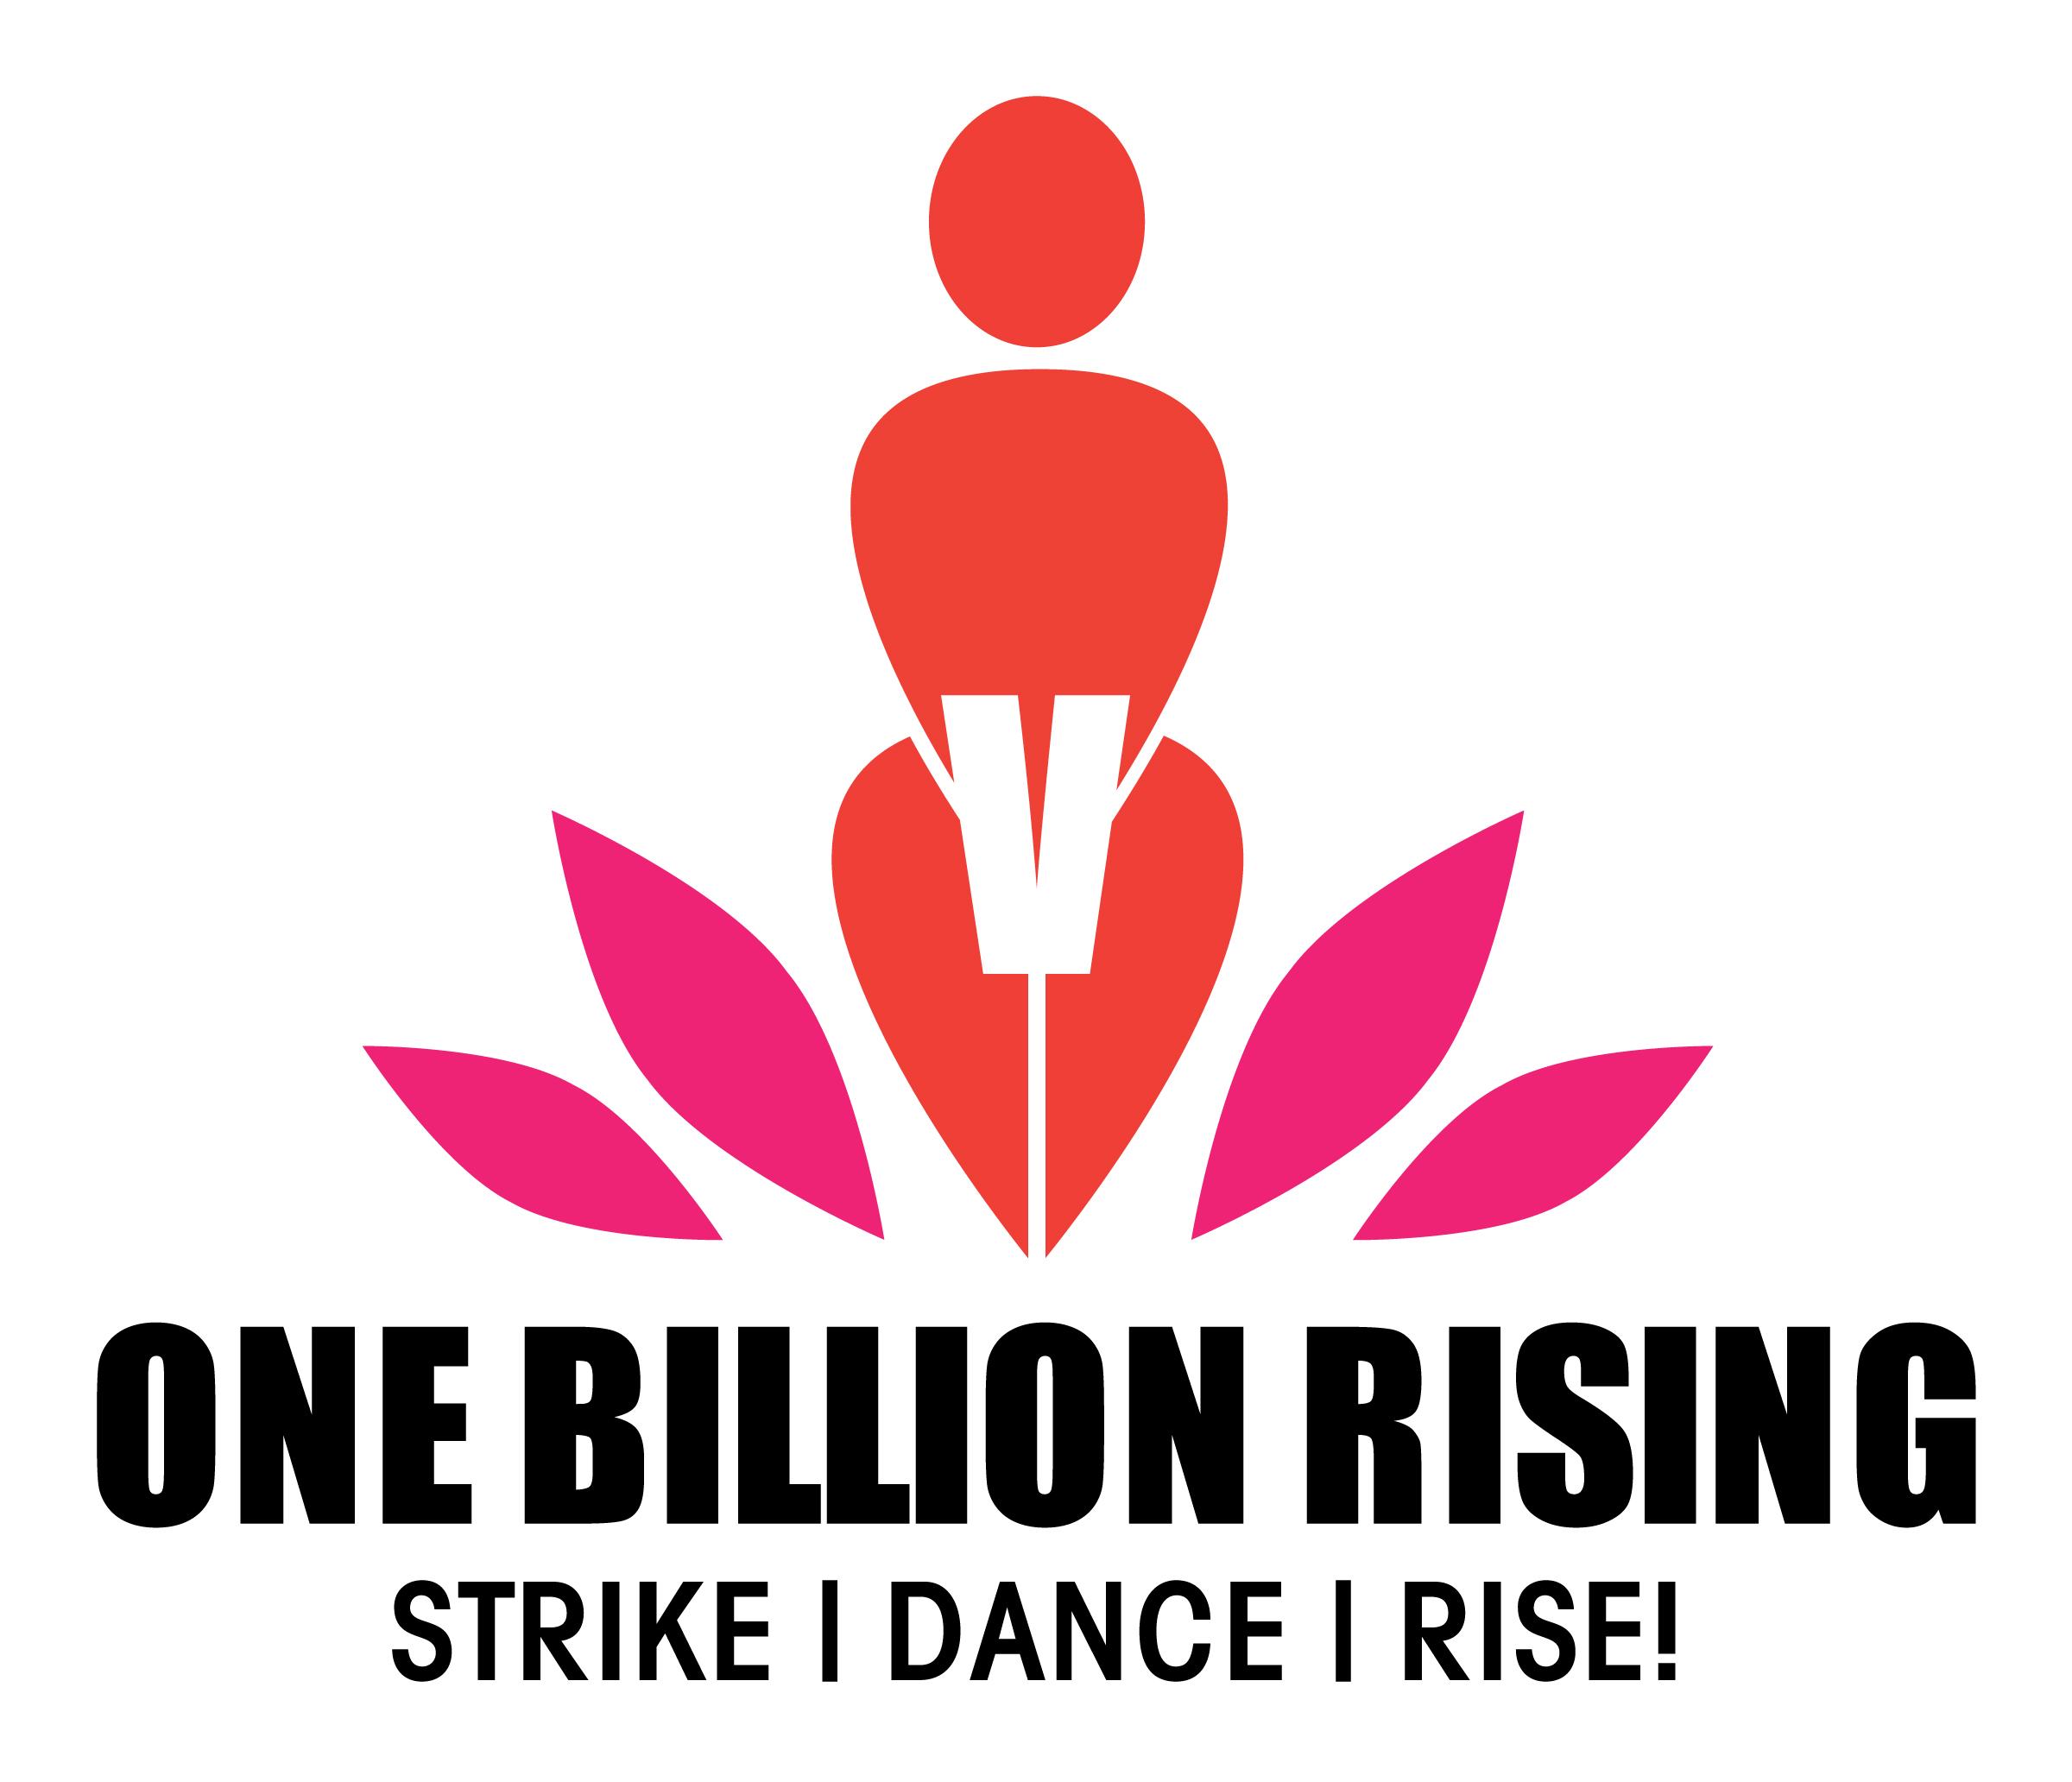 manifestazione planetaria organizzata da Eve Ensler